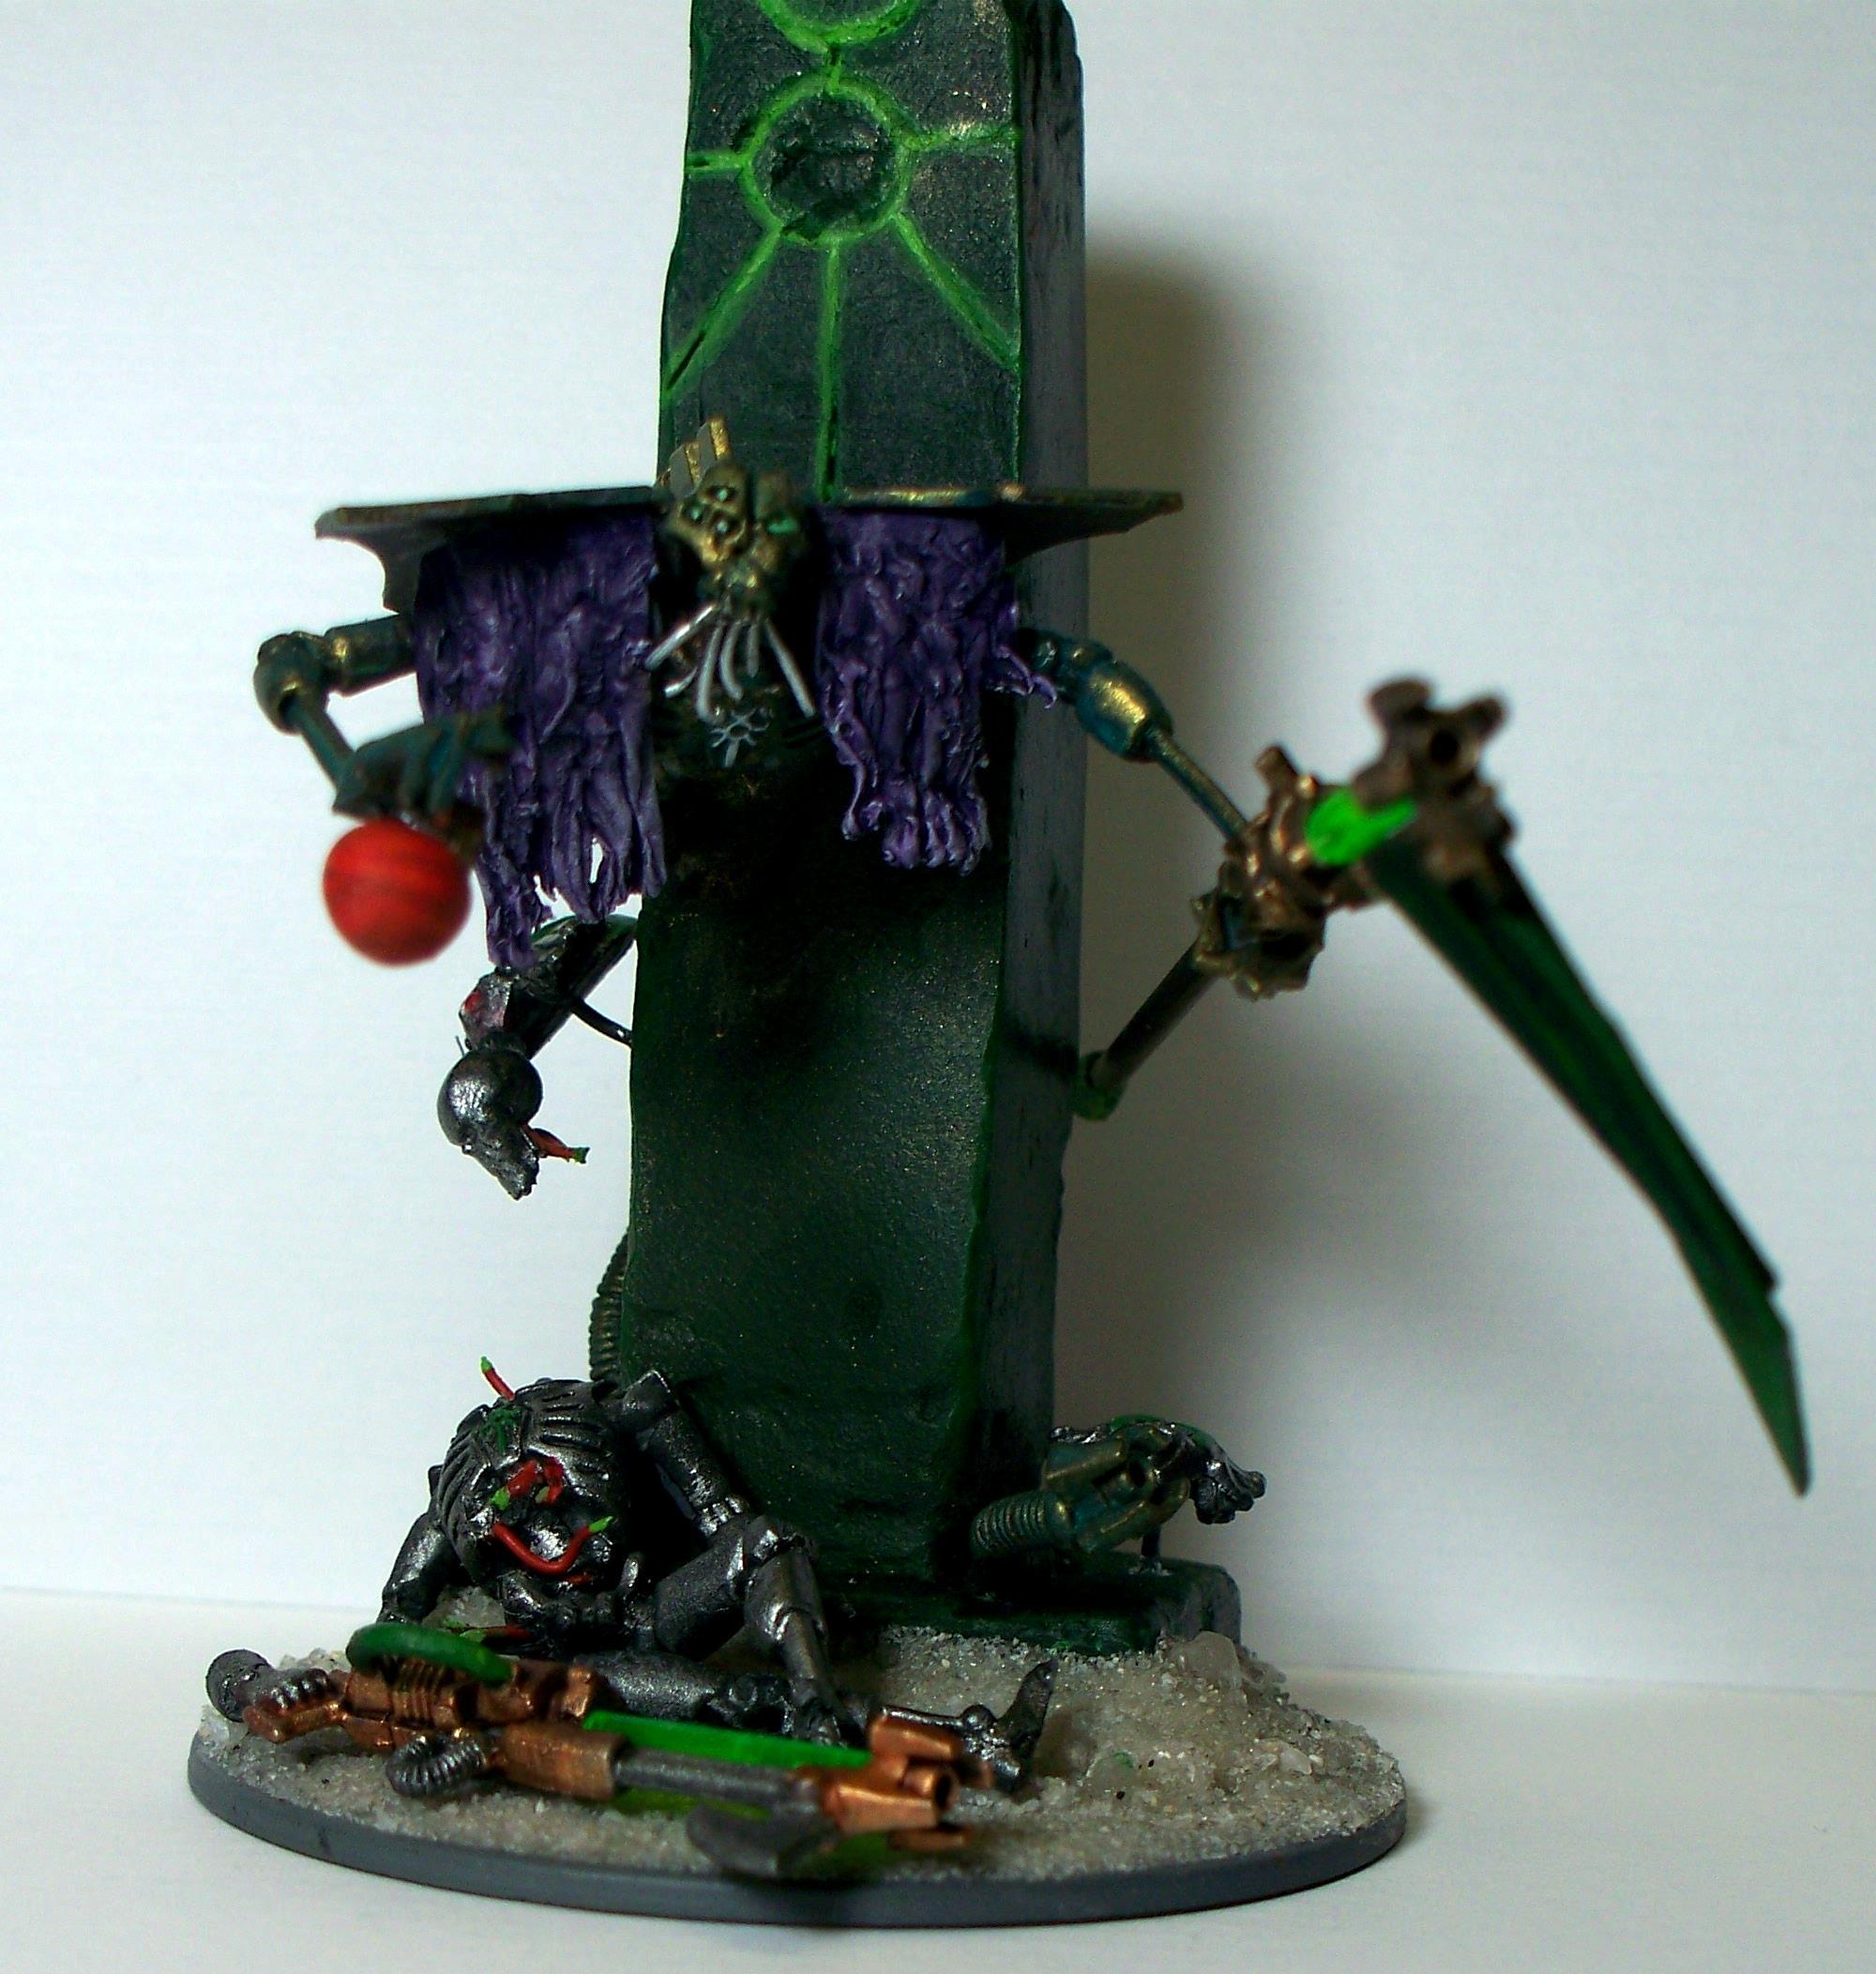 Destroyer Lord, Necron Lord, Necrons, Warhammer 40,000, Wraith